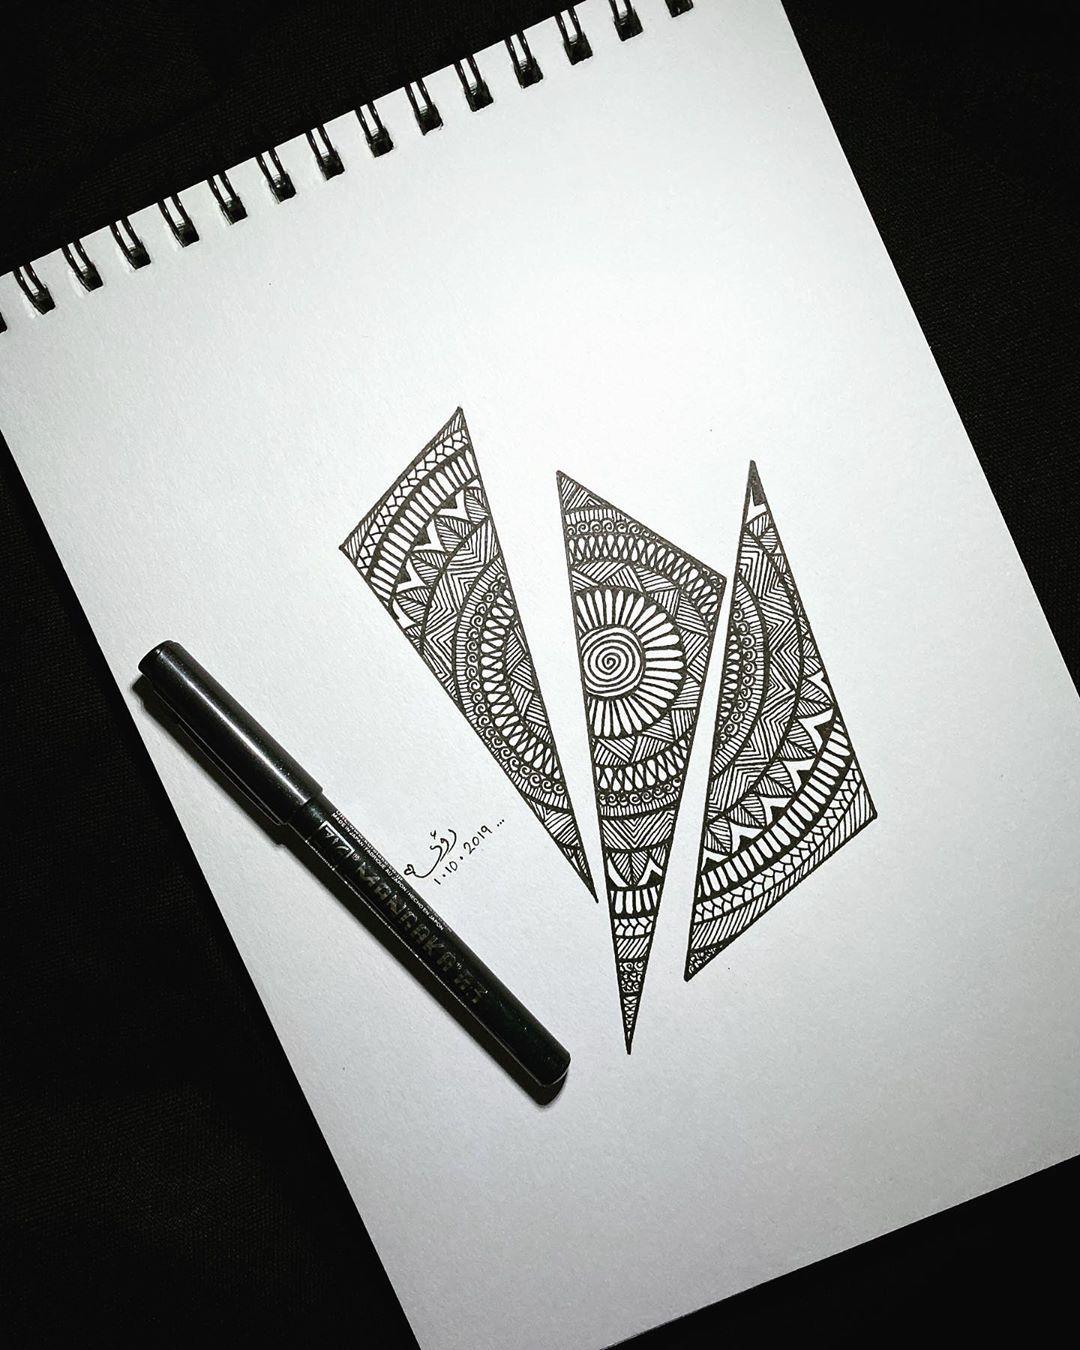 Draw Drawing Drawings Art Arts Artist Mandala Mandalala Mandalatattoo Mandalas Ink Black White Zendoodle Zenart D Instagram Posts Instagram Ink